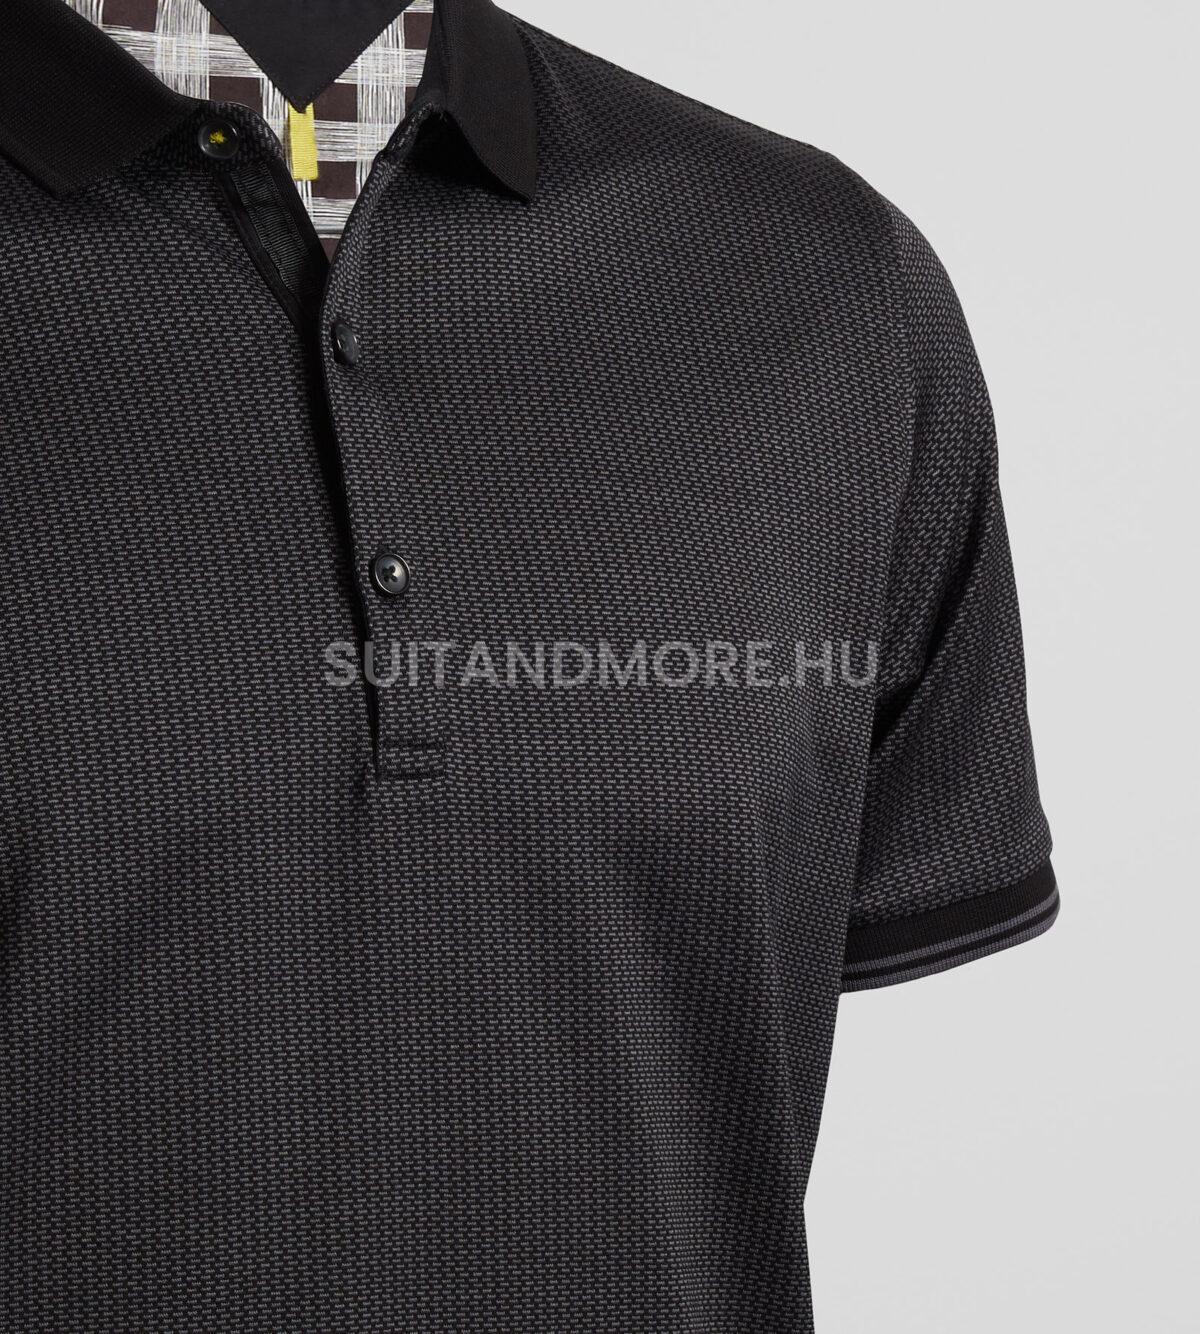 DIGEL-fekete-slim-fit-ingpóló-ANDREA-1-2-1168113-10-02